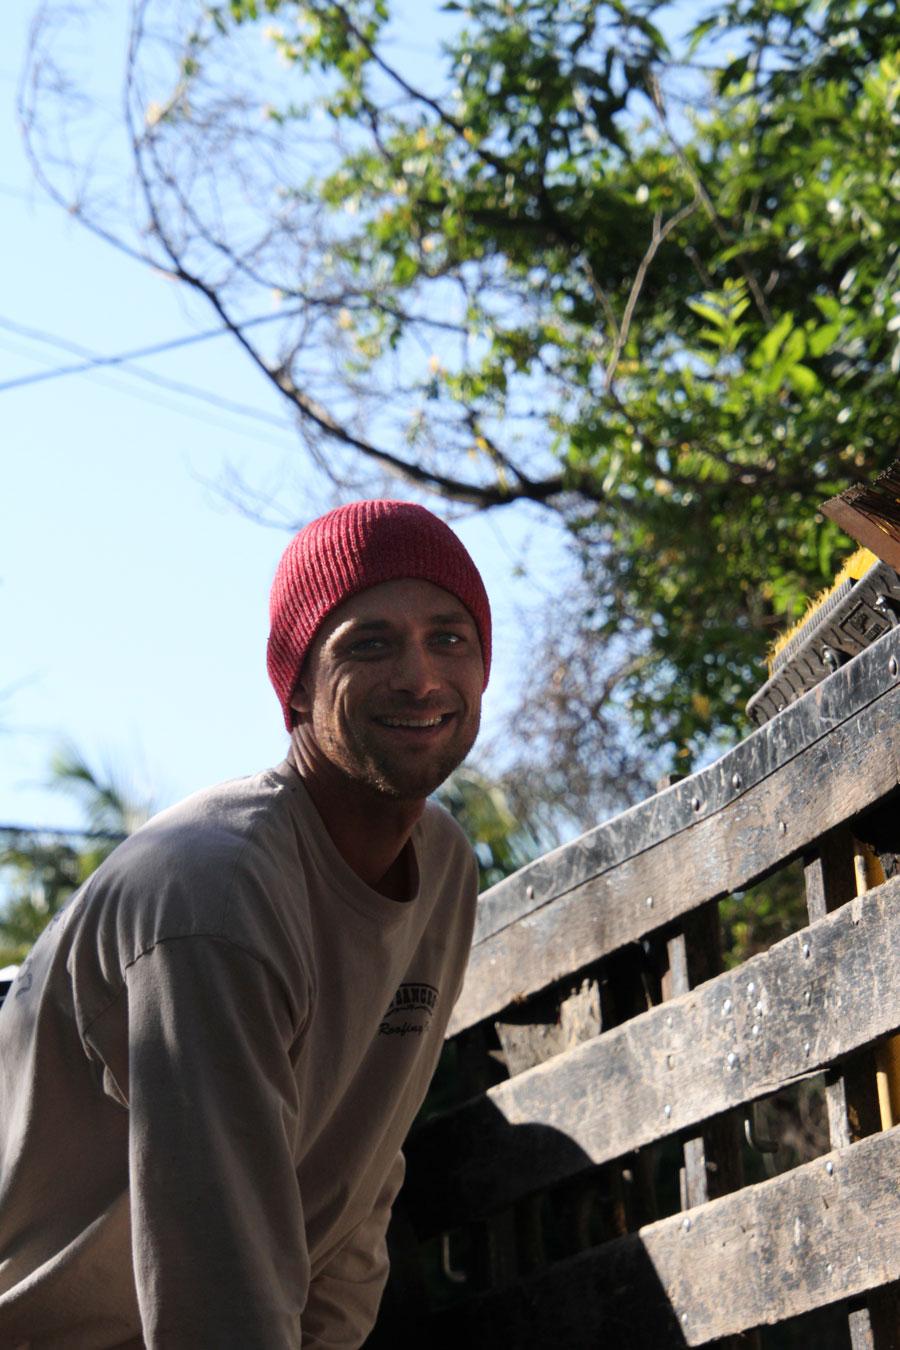 Darren Bancroft on job site - Paul Bancroft Roofing - Los Angeles Roofing